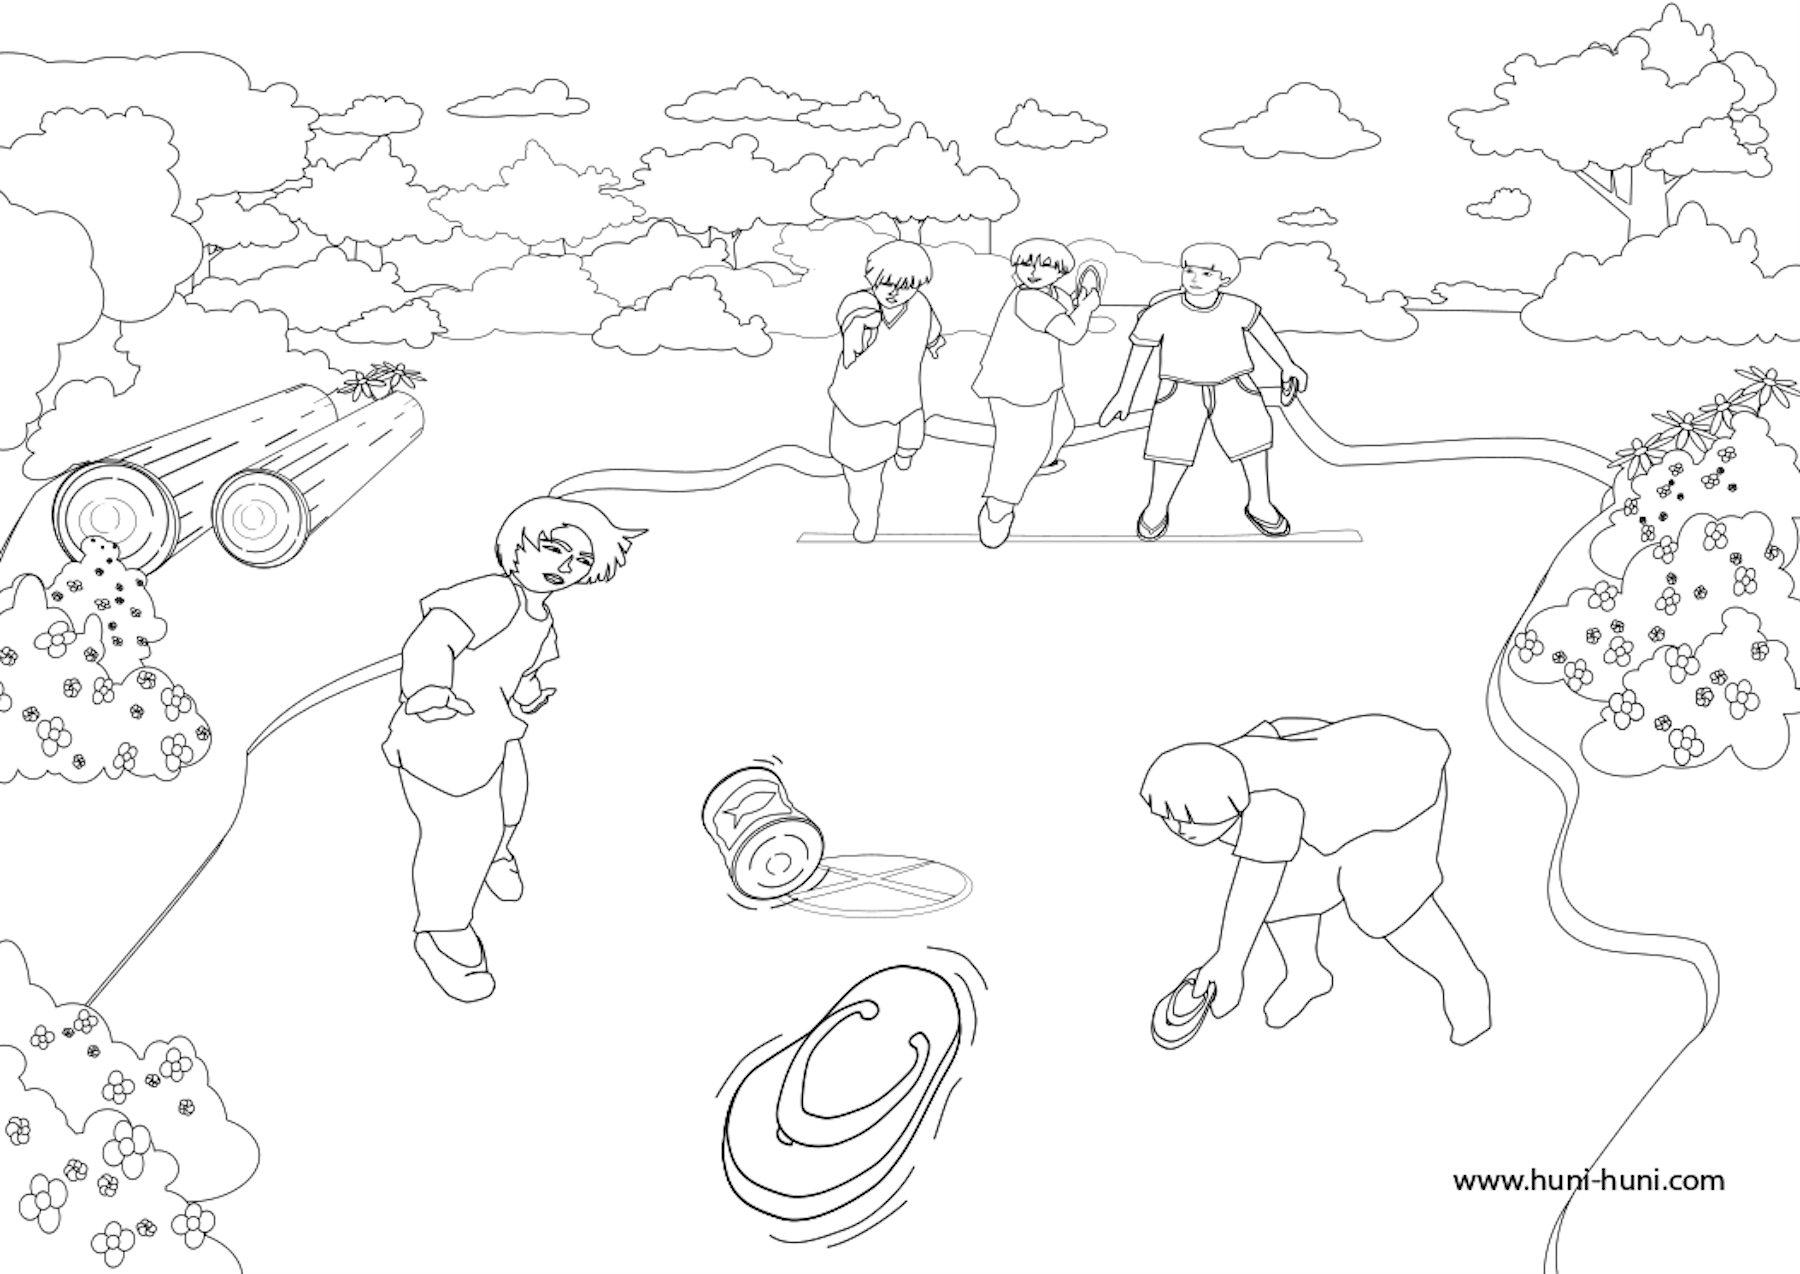 huni-huni-coloring-page-tumba-lata